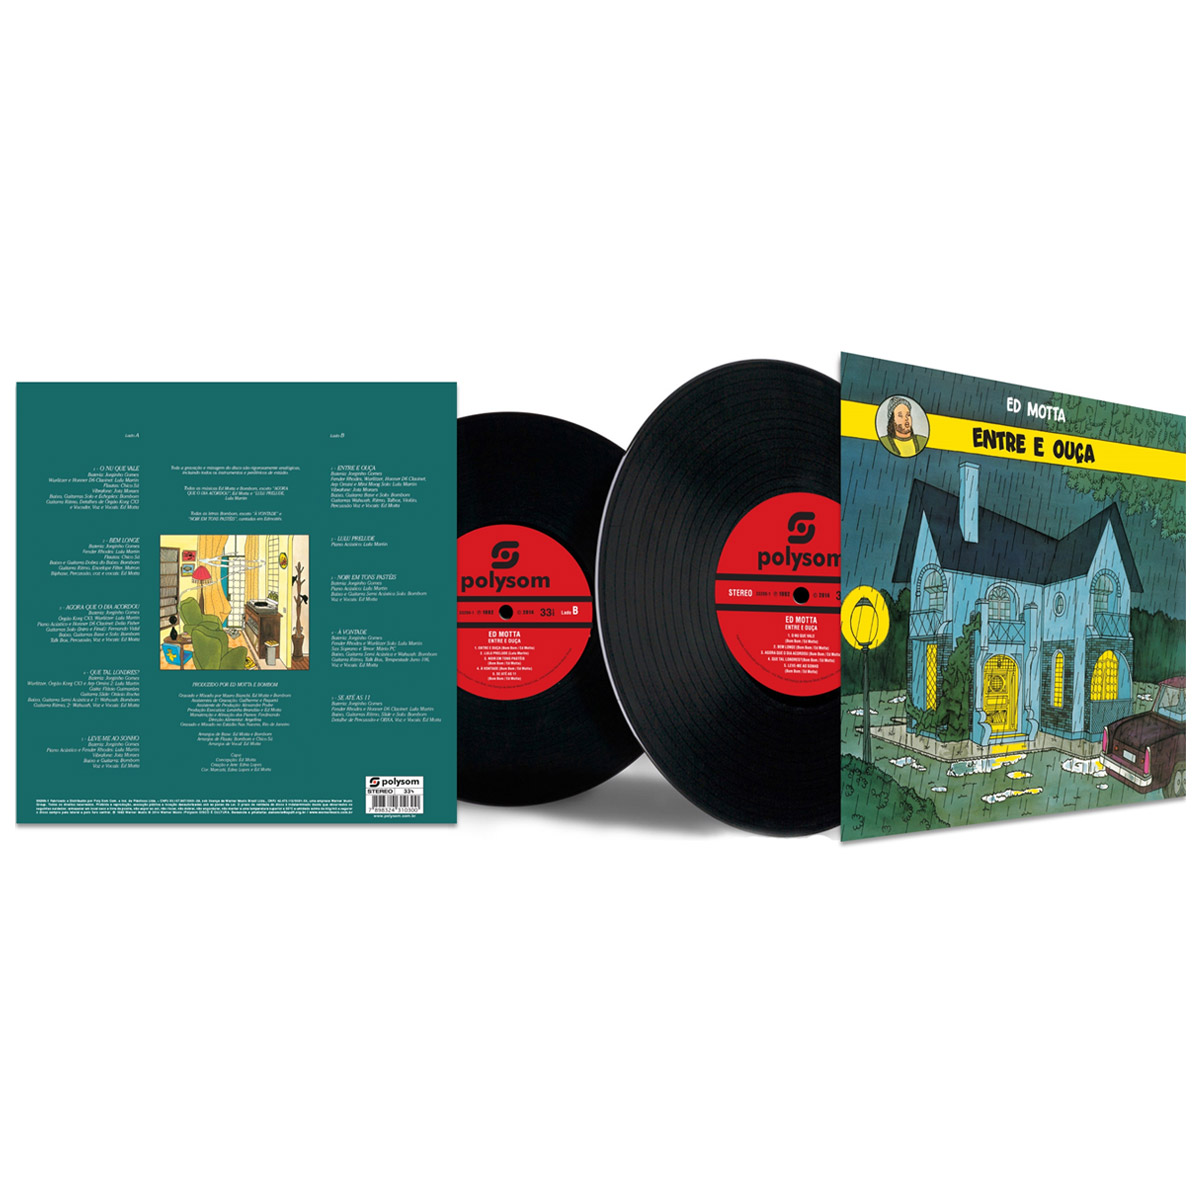 LP Ed Motta Entre e Ouça  - bandUP Store Marketplace